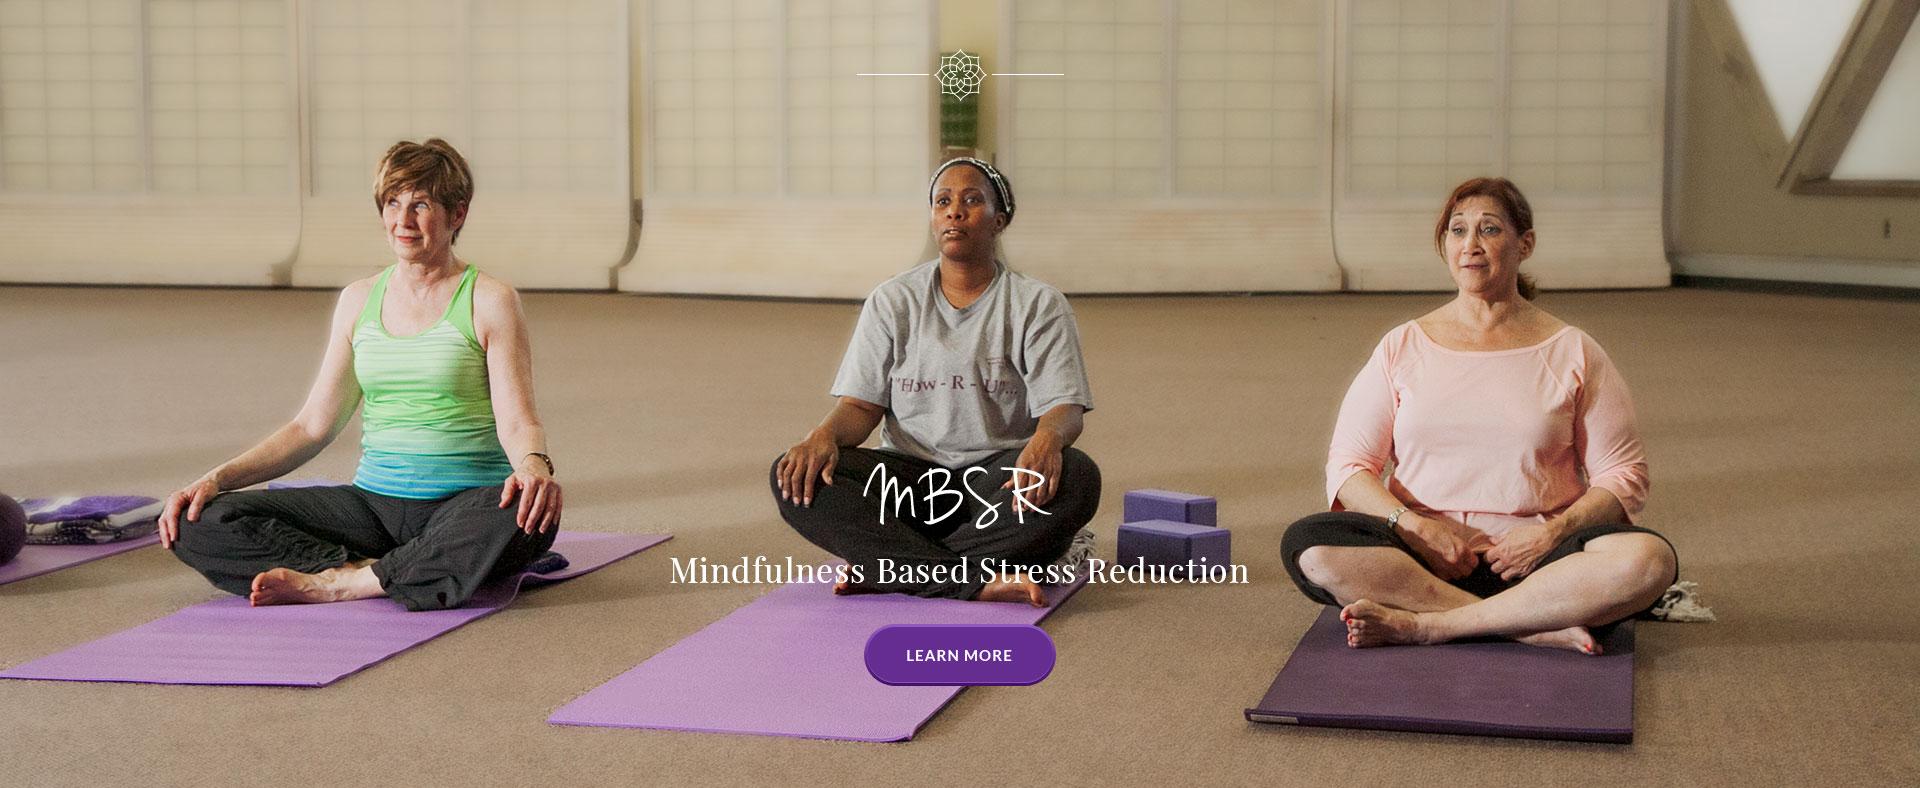 Mindfulness-Based Stress Reduction